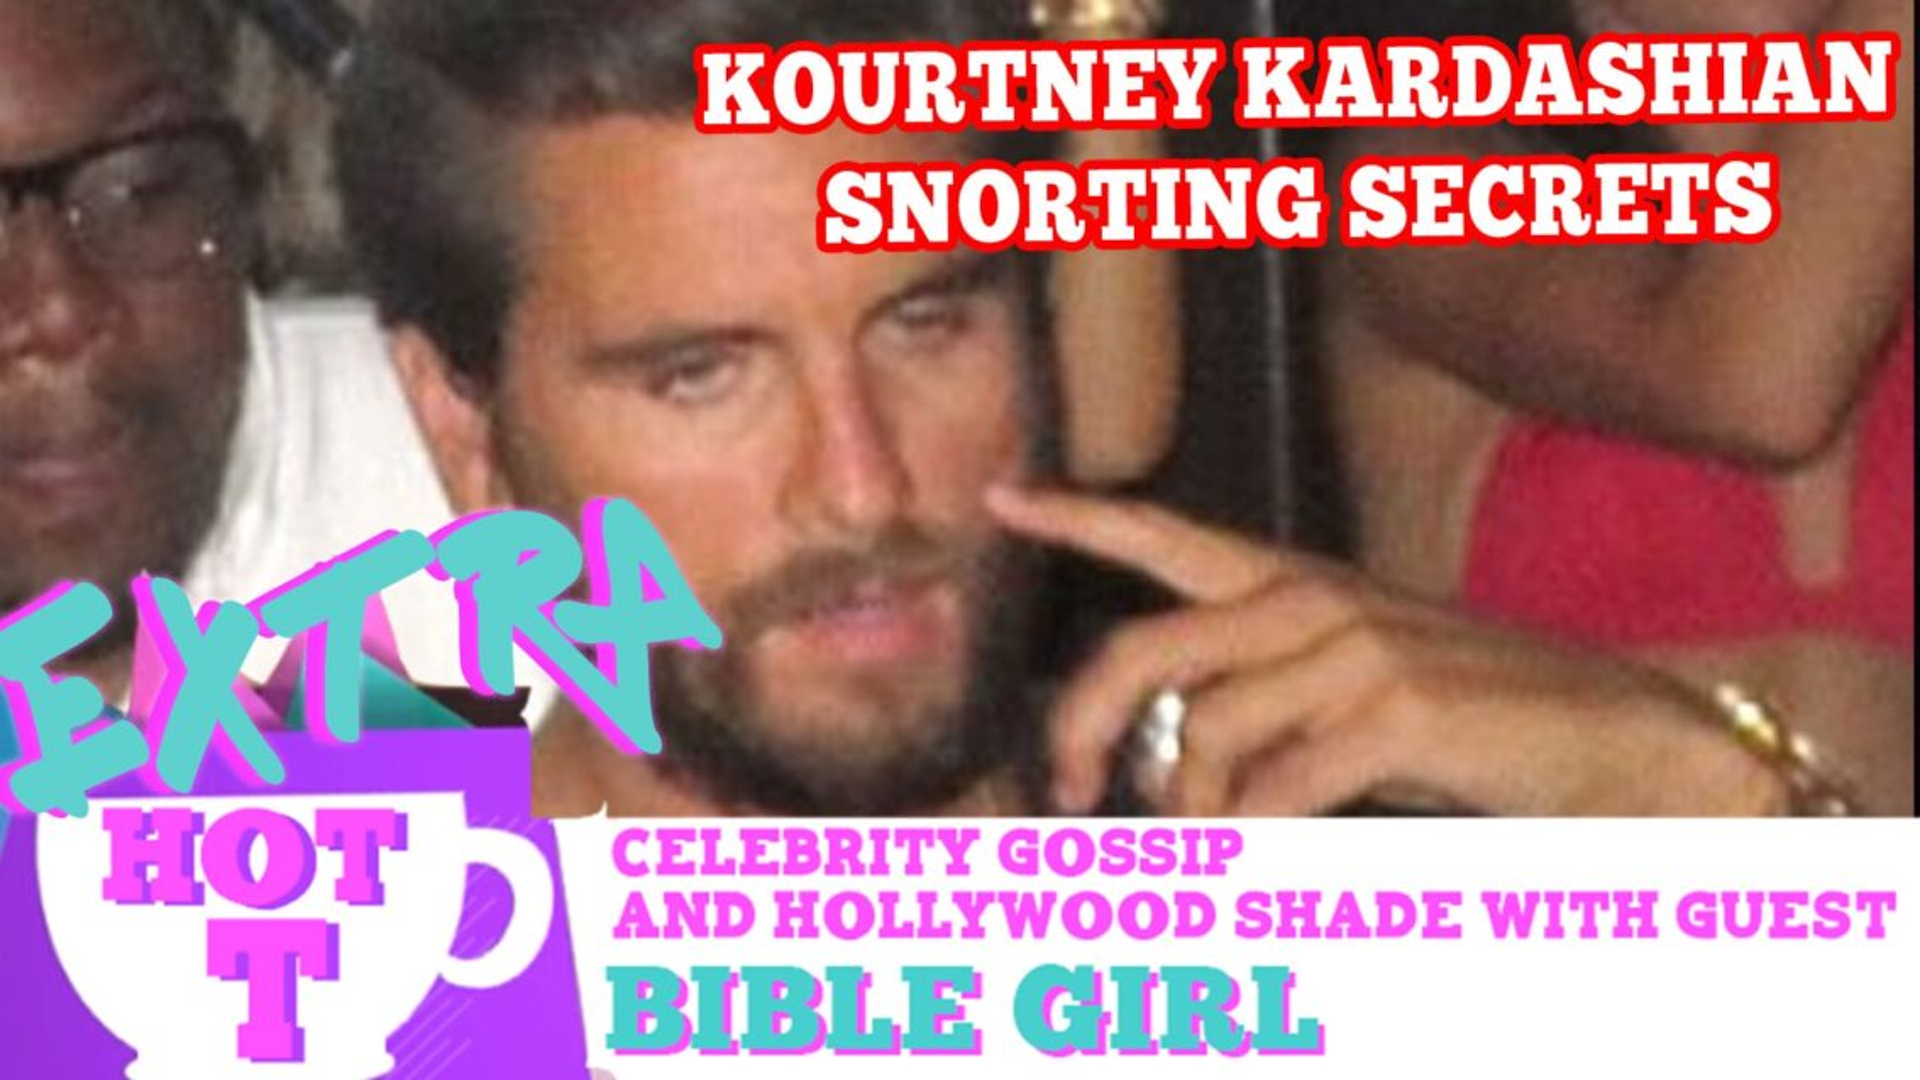 Kourtney Kardashian's Snorting Secrets!: Extra Hot T with Bible Girl